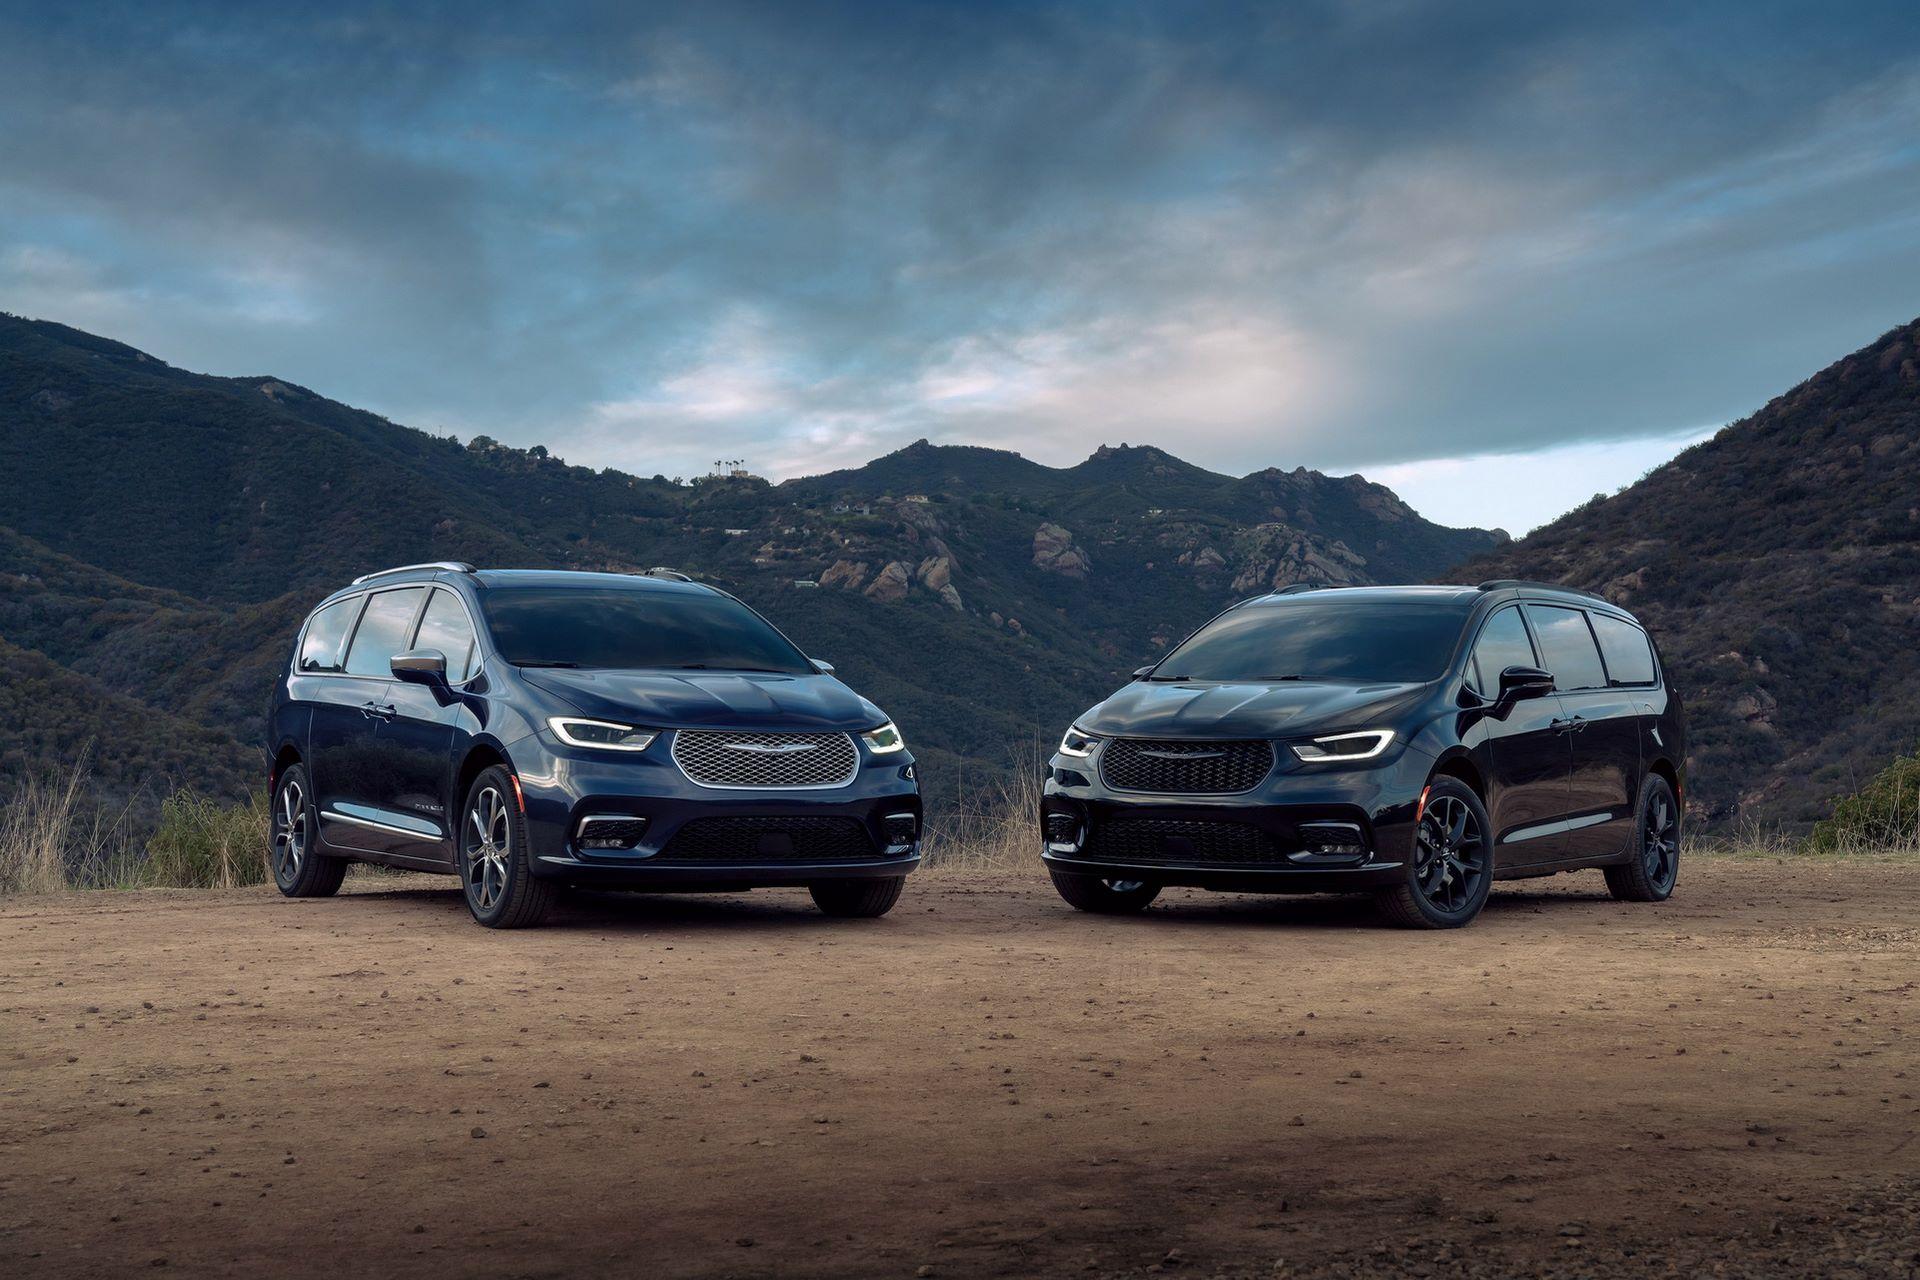 2021-Chrysler-Pacifica-36